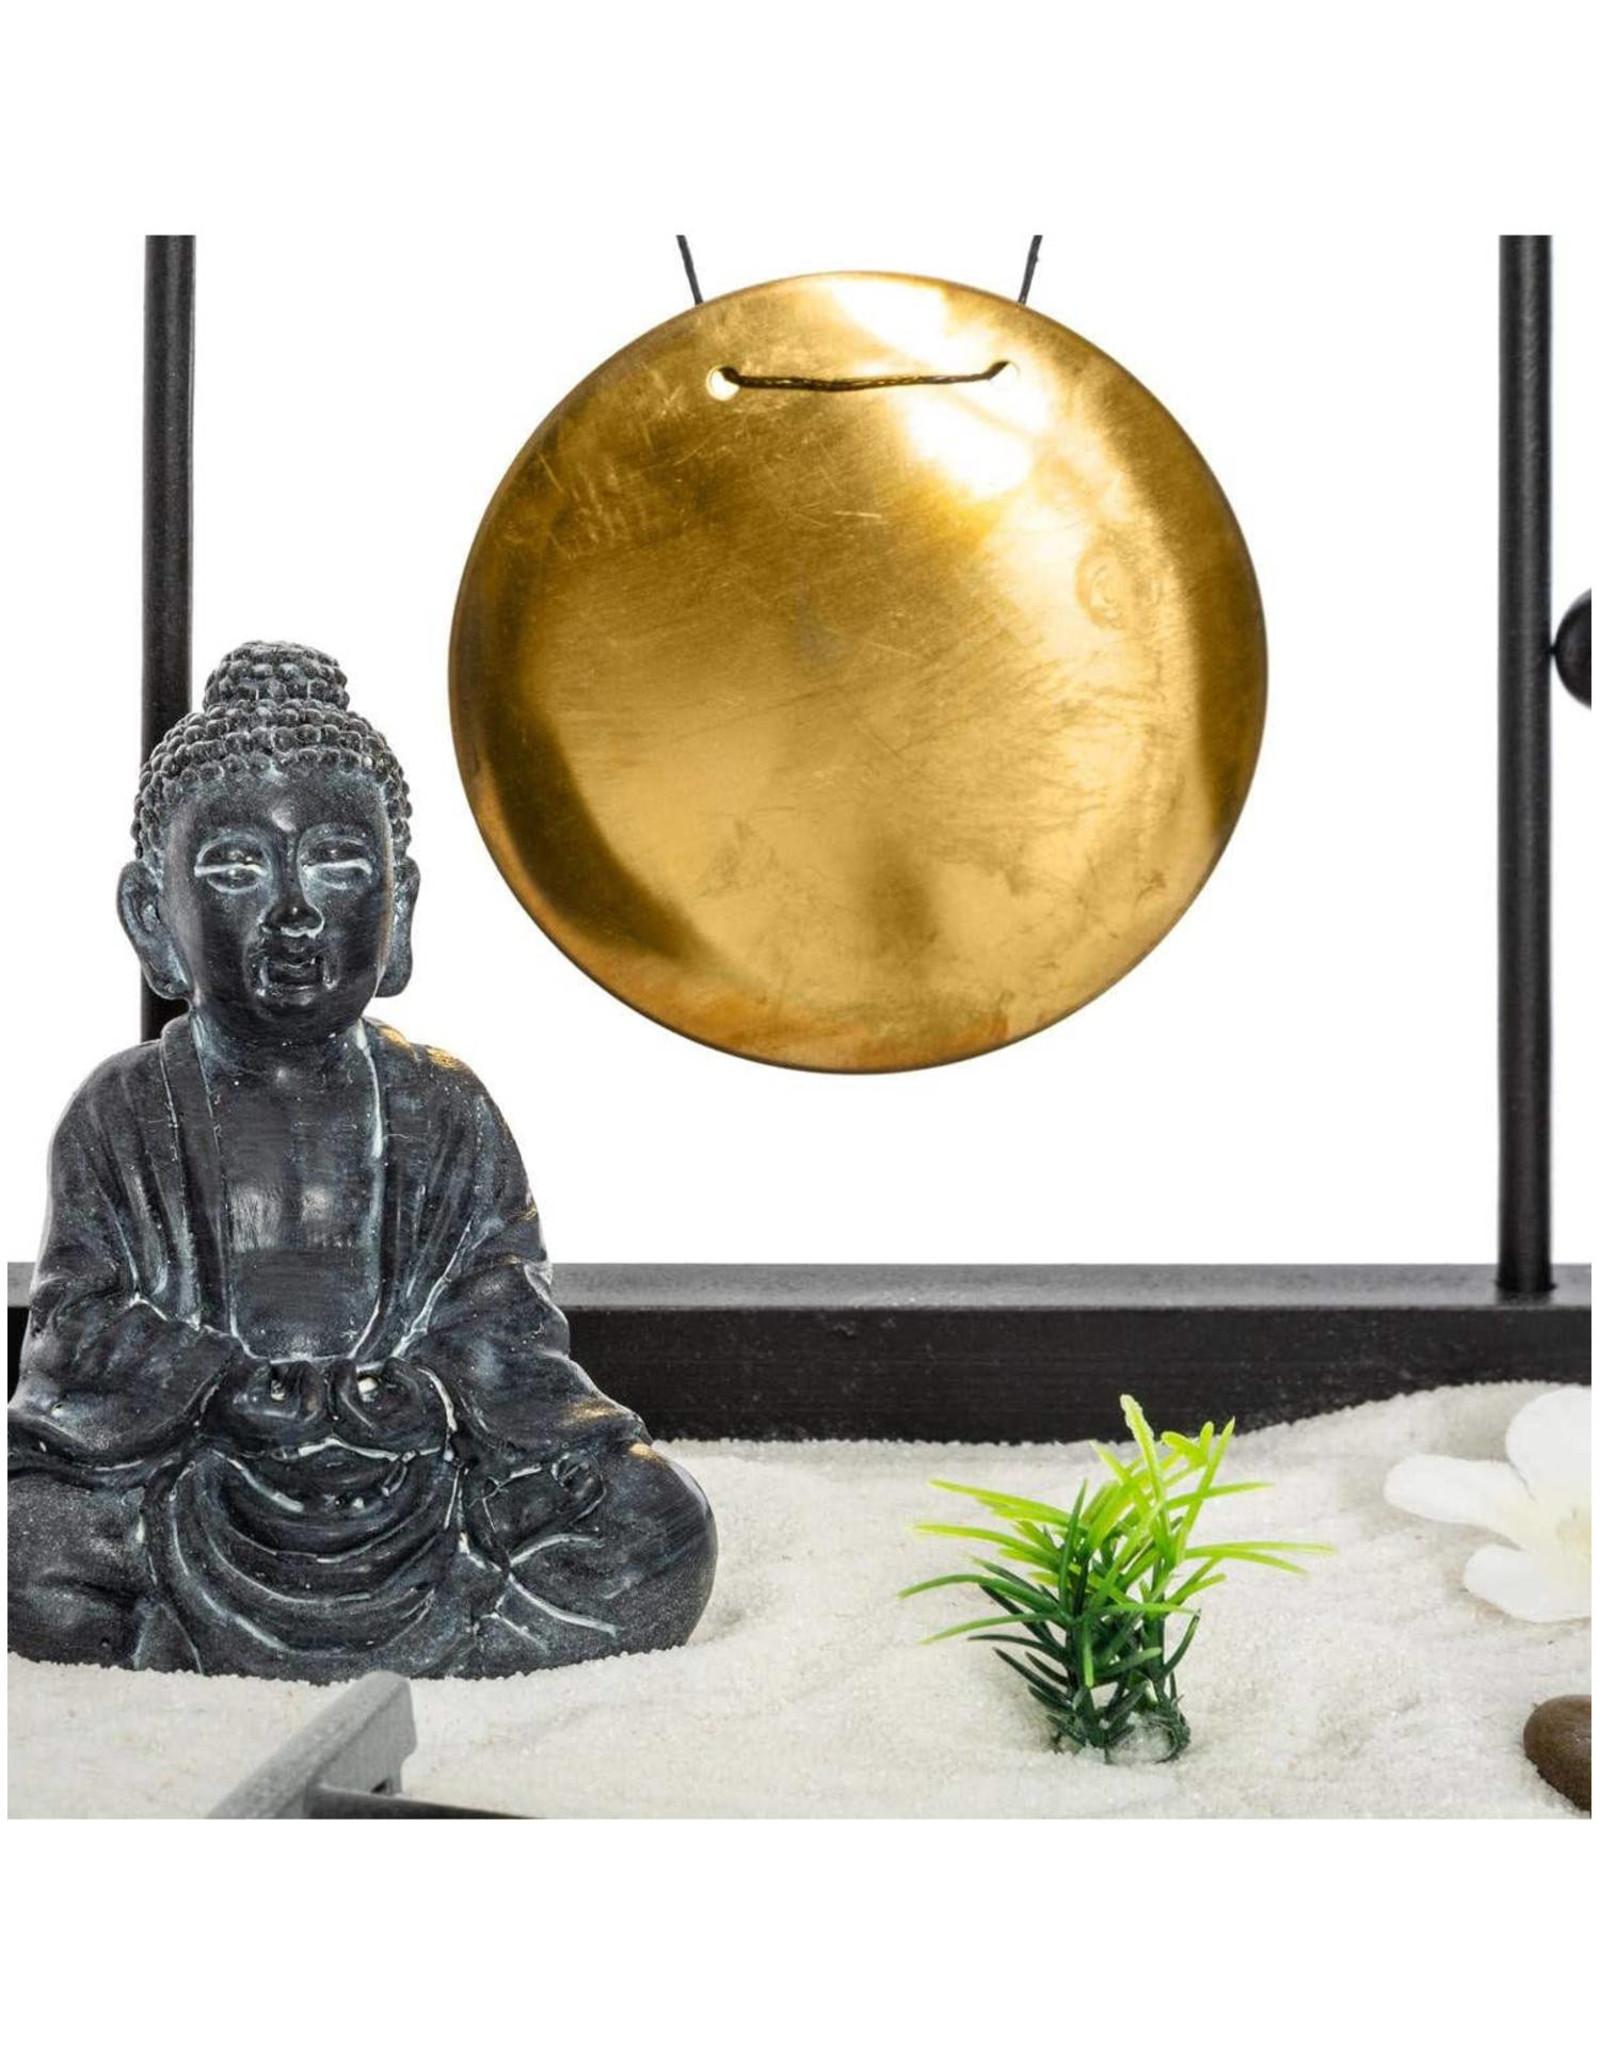 Atmosphera Atmosphera - Buddha Zen Tuinset Op Houten Plateau Met Gong- 26x26x11cm